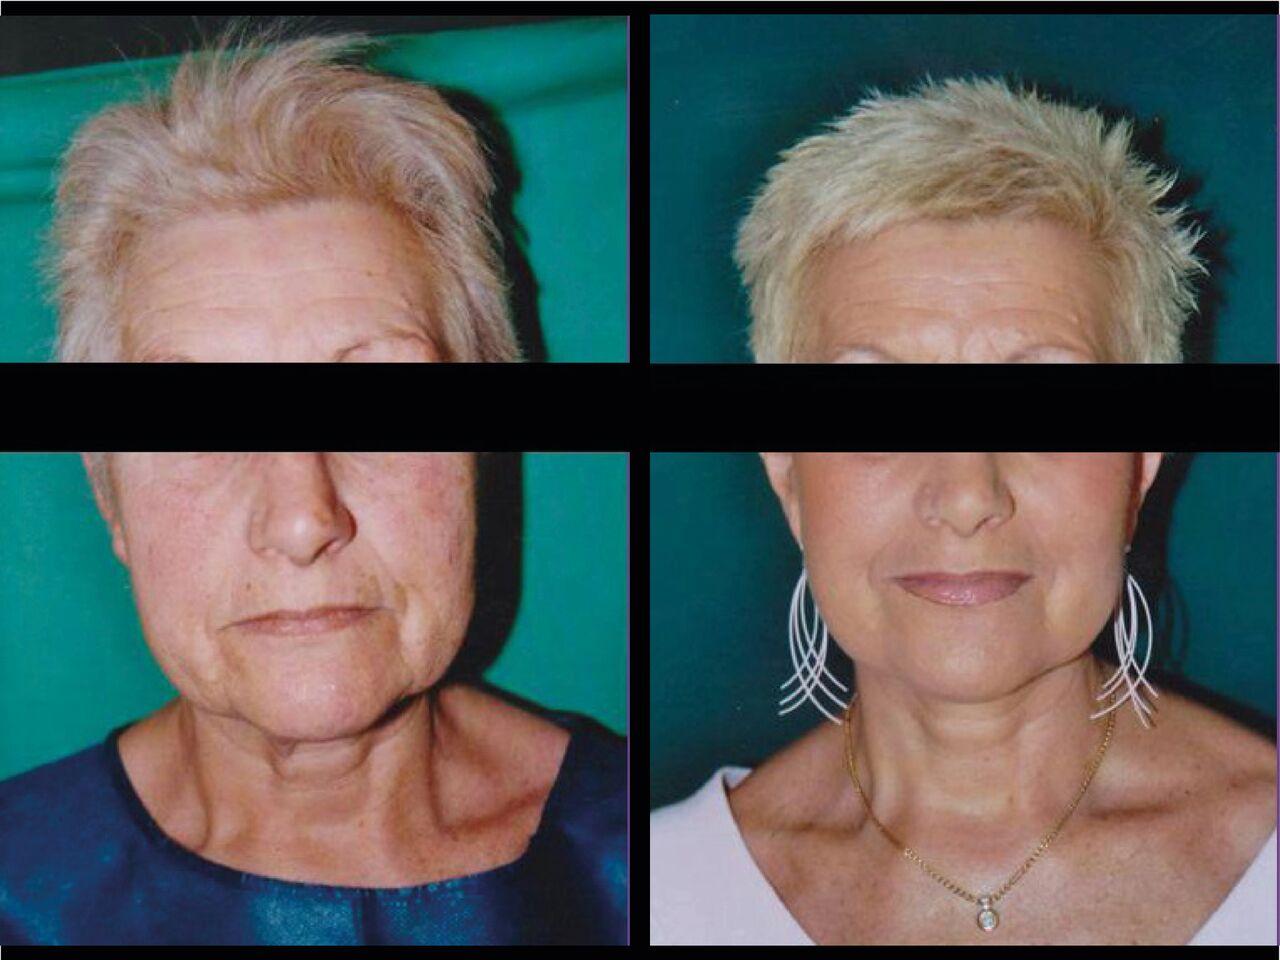 Cervico-Facial Chirurgie Esthetique Lifting Visage Nyon